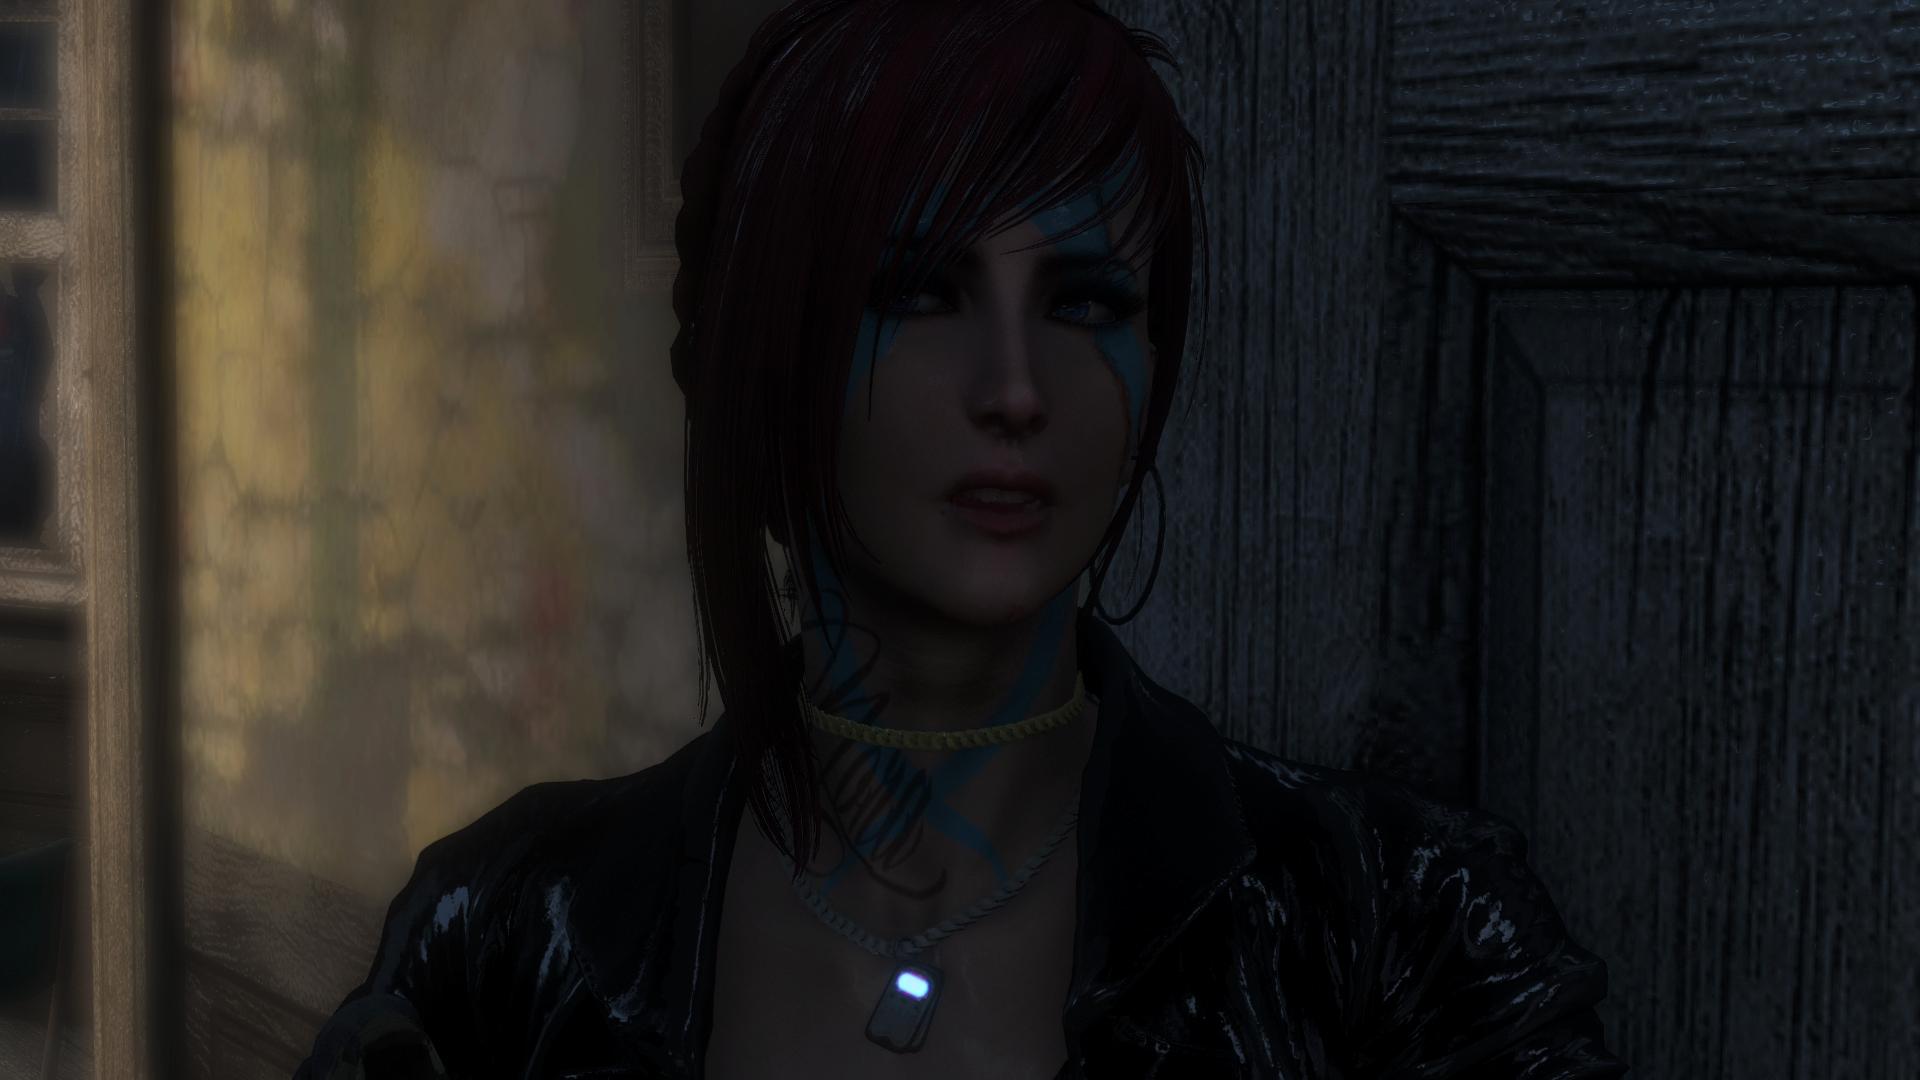 Nora Falloutovna - Fallout 4